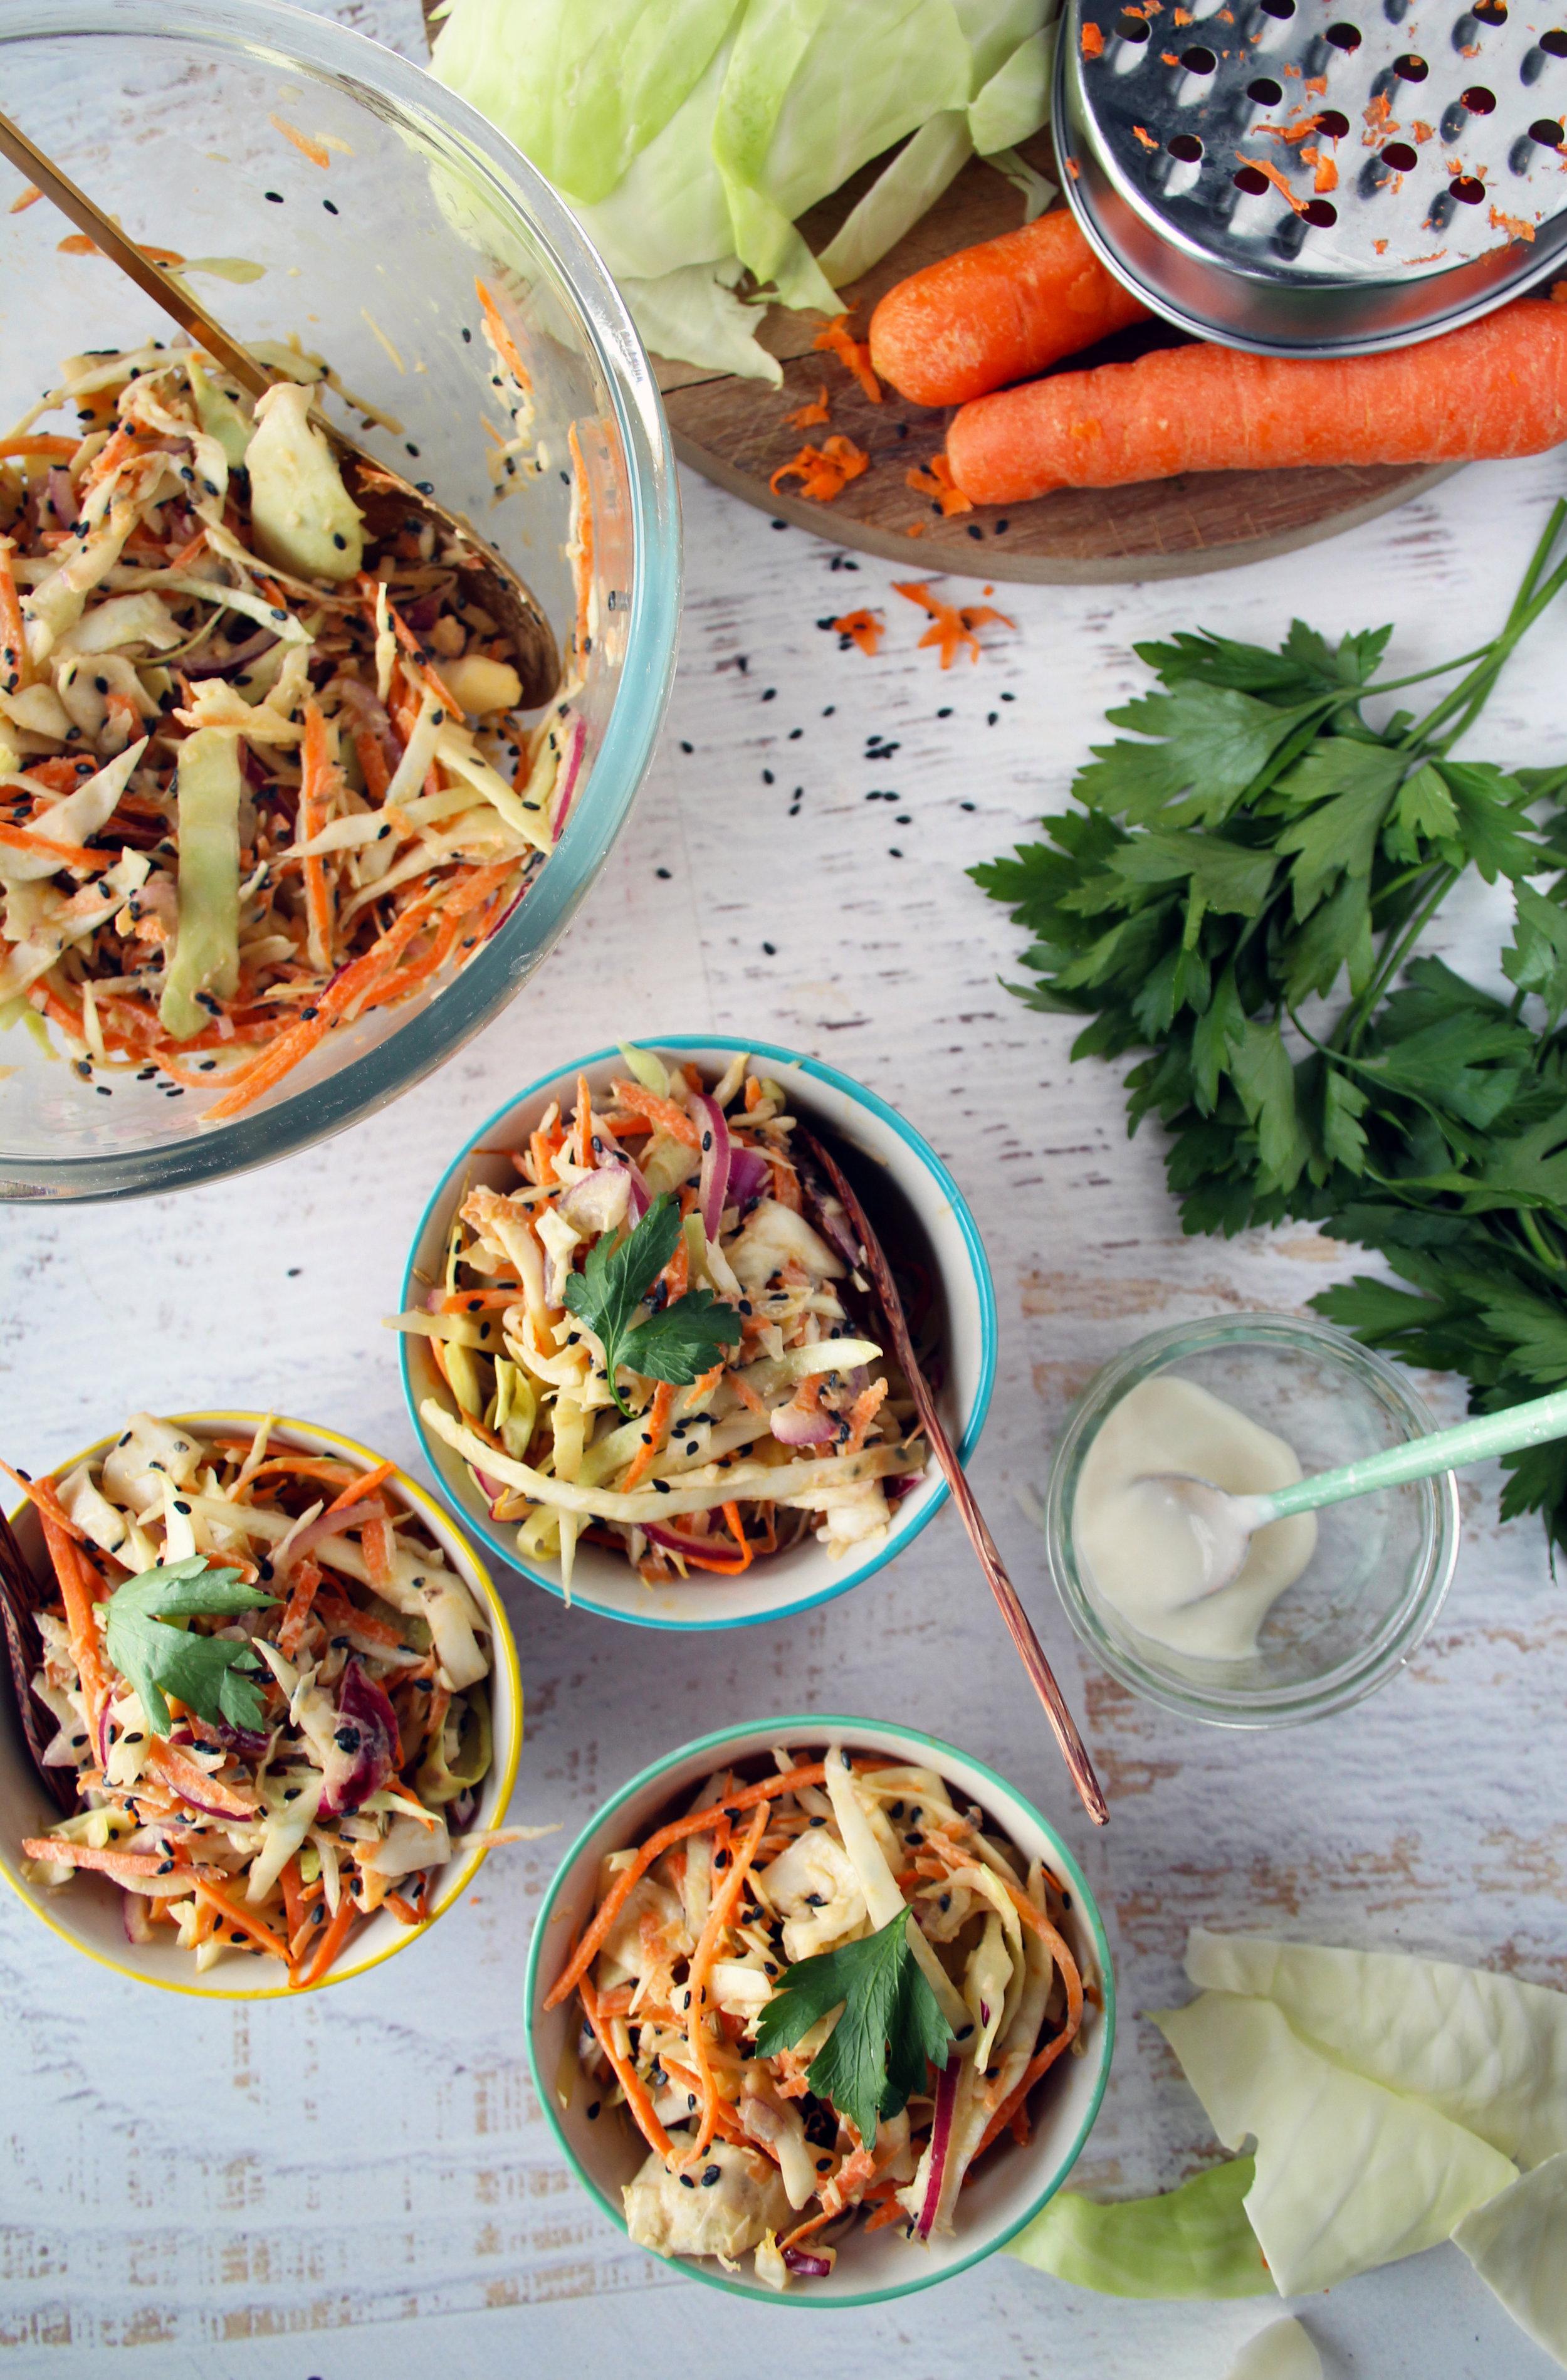 Asia rainbow slaw recipe   The Flourishing Pantry